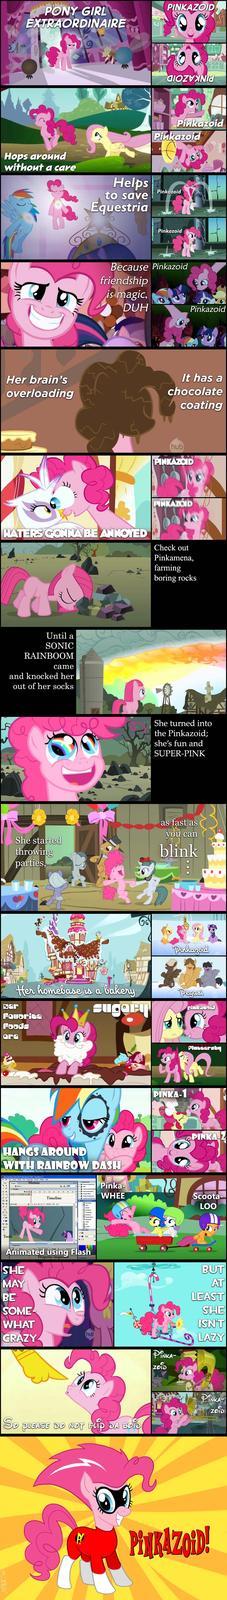 Pinkazoid.jpg